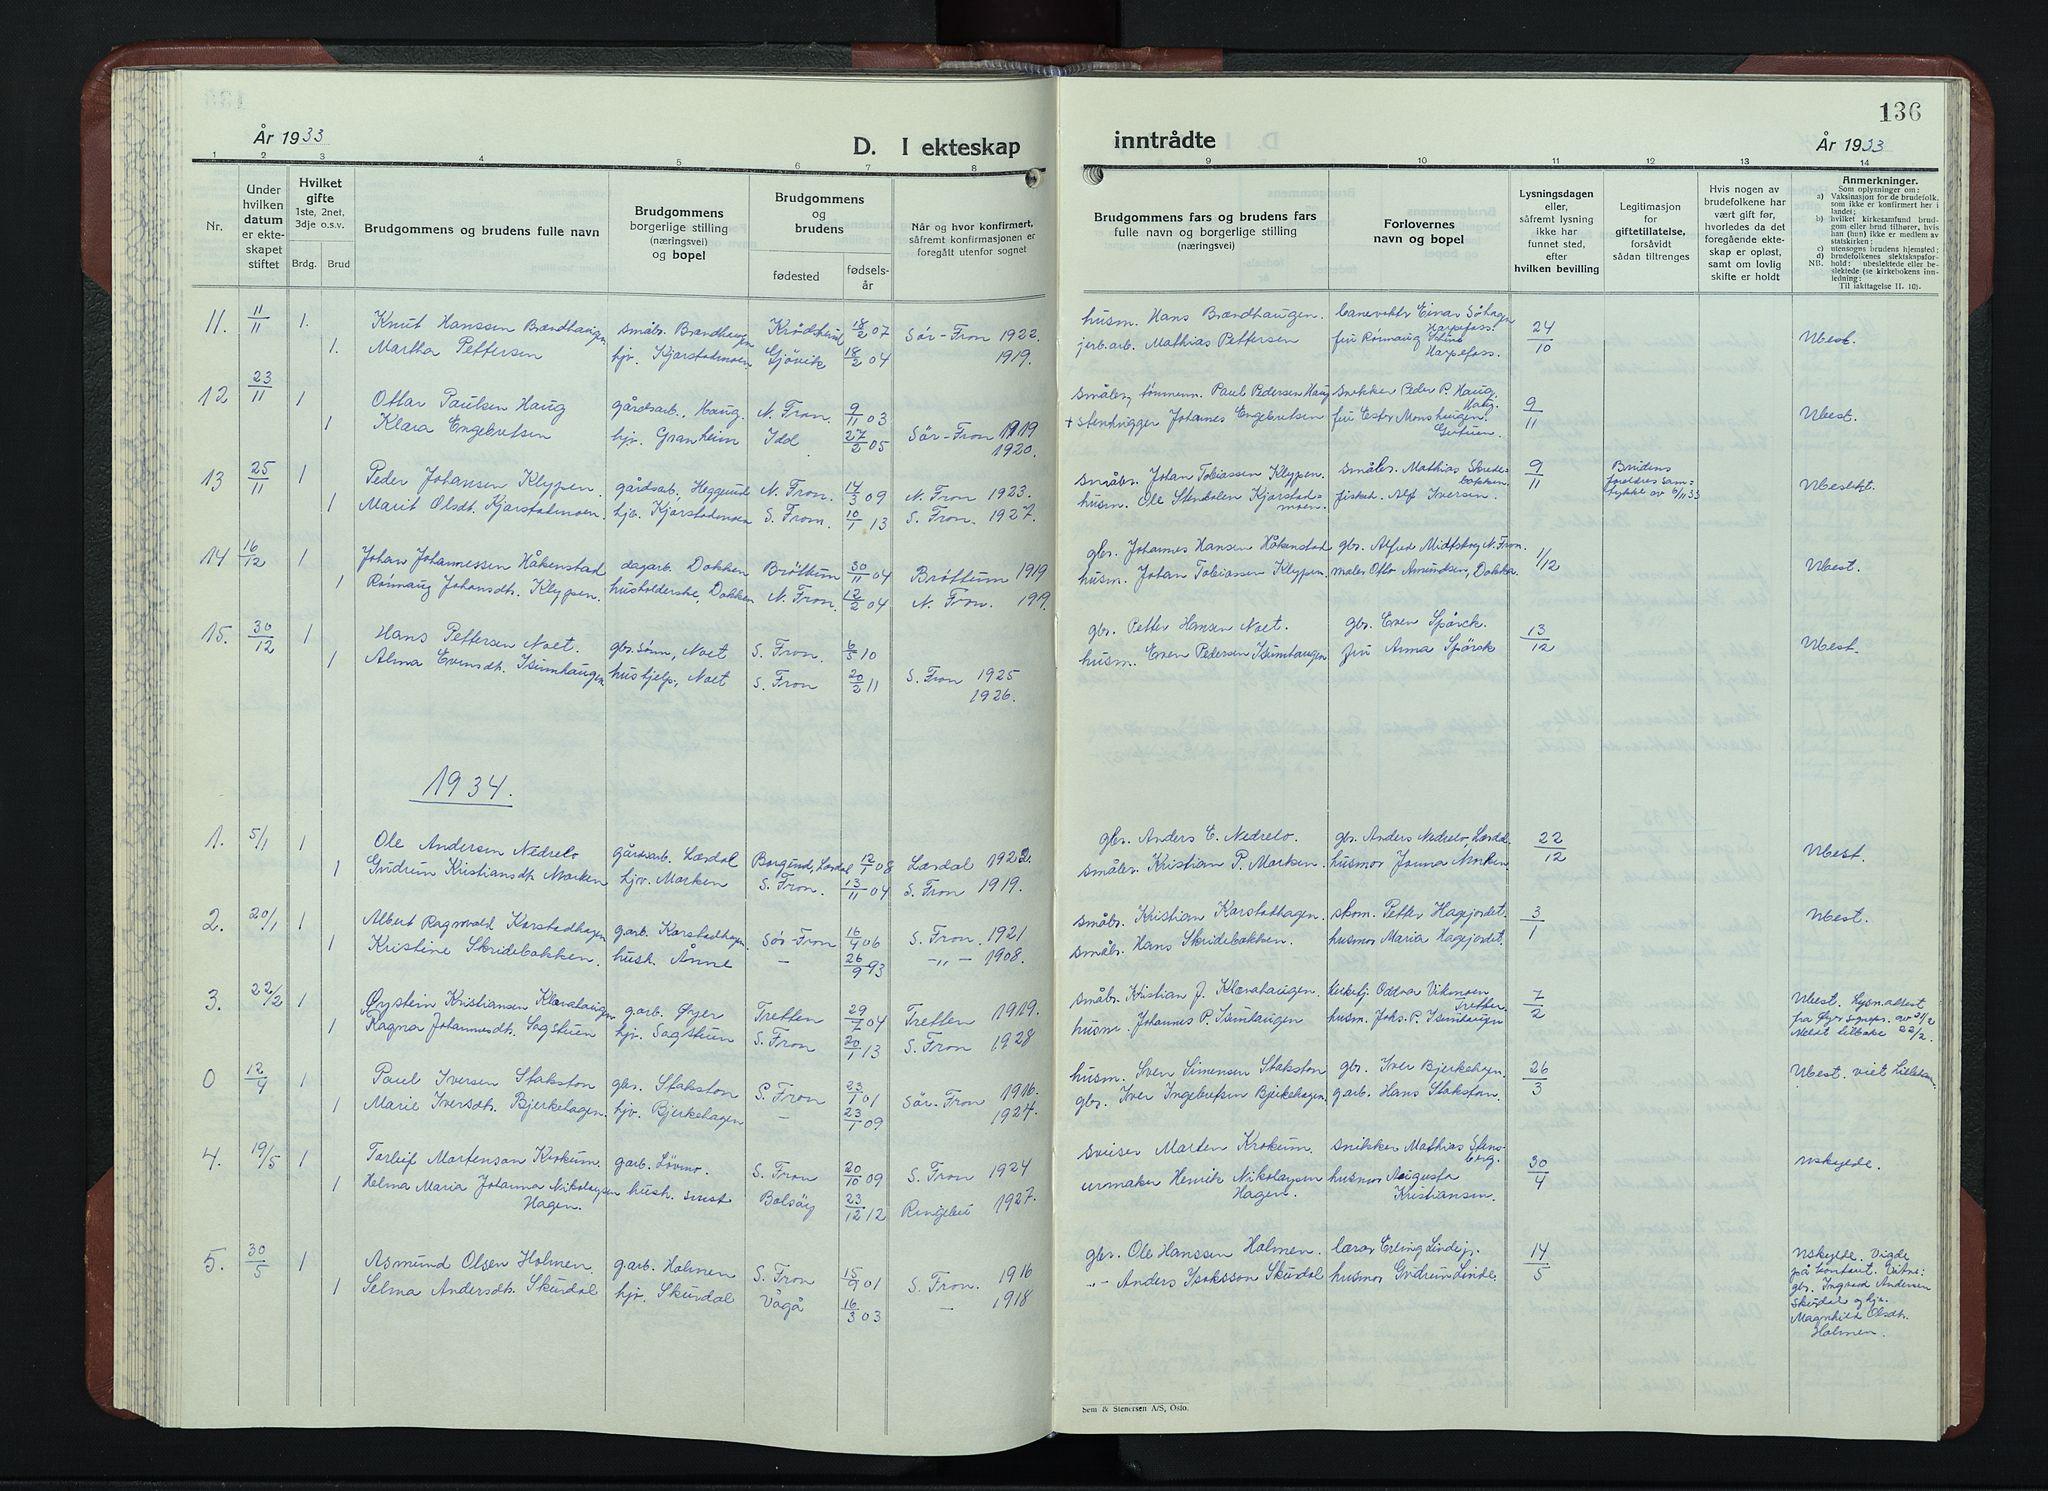 SAH, Sør-Fron prestekontor, H/Ha/Hab/L0006: Klokkerbok nr. 6, 1933-1948, s. 136